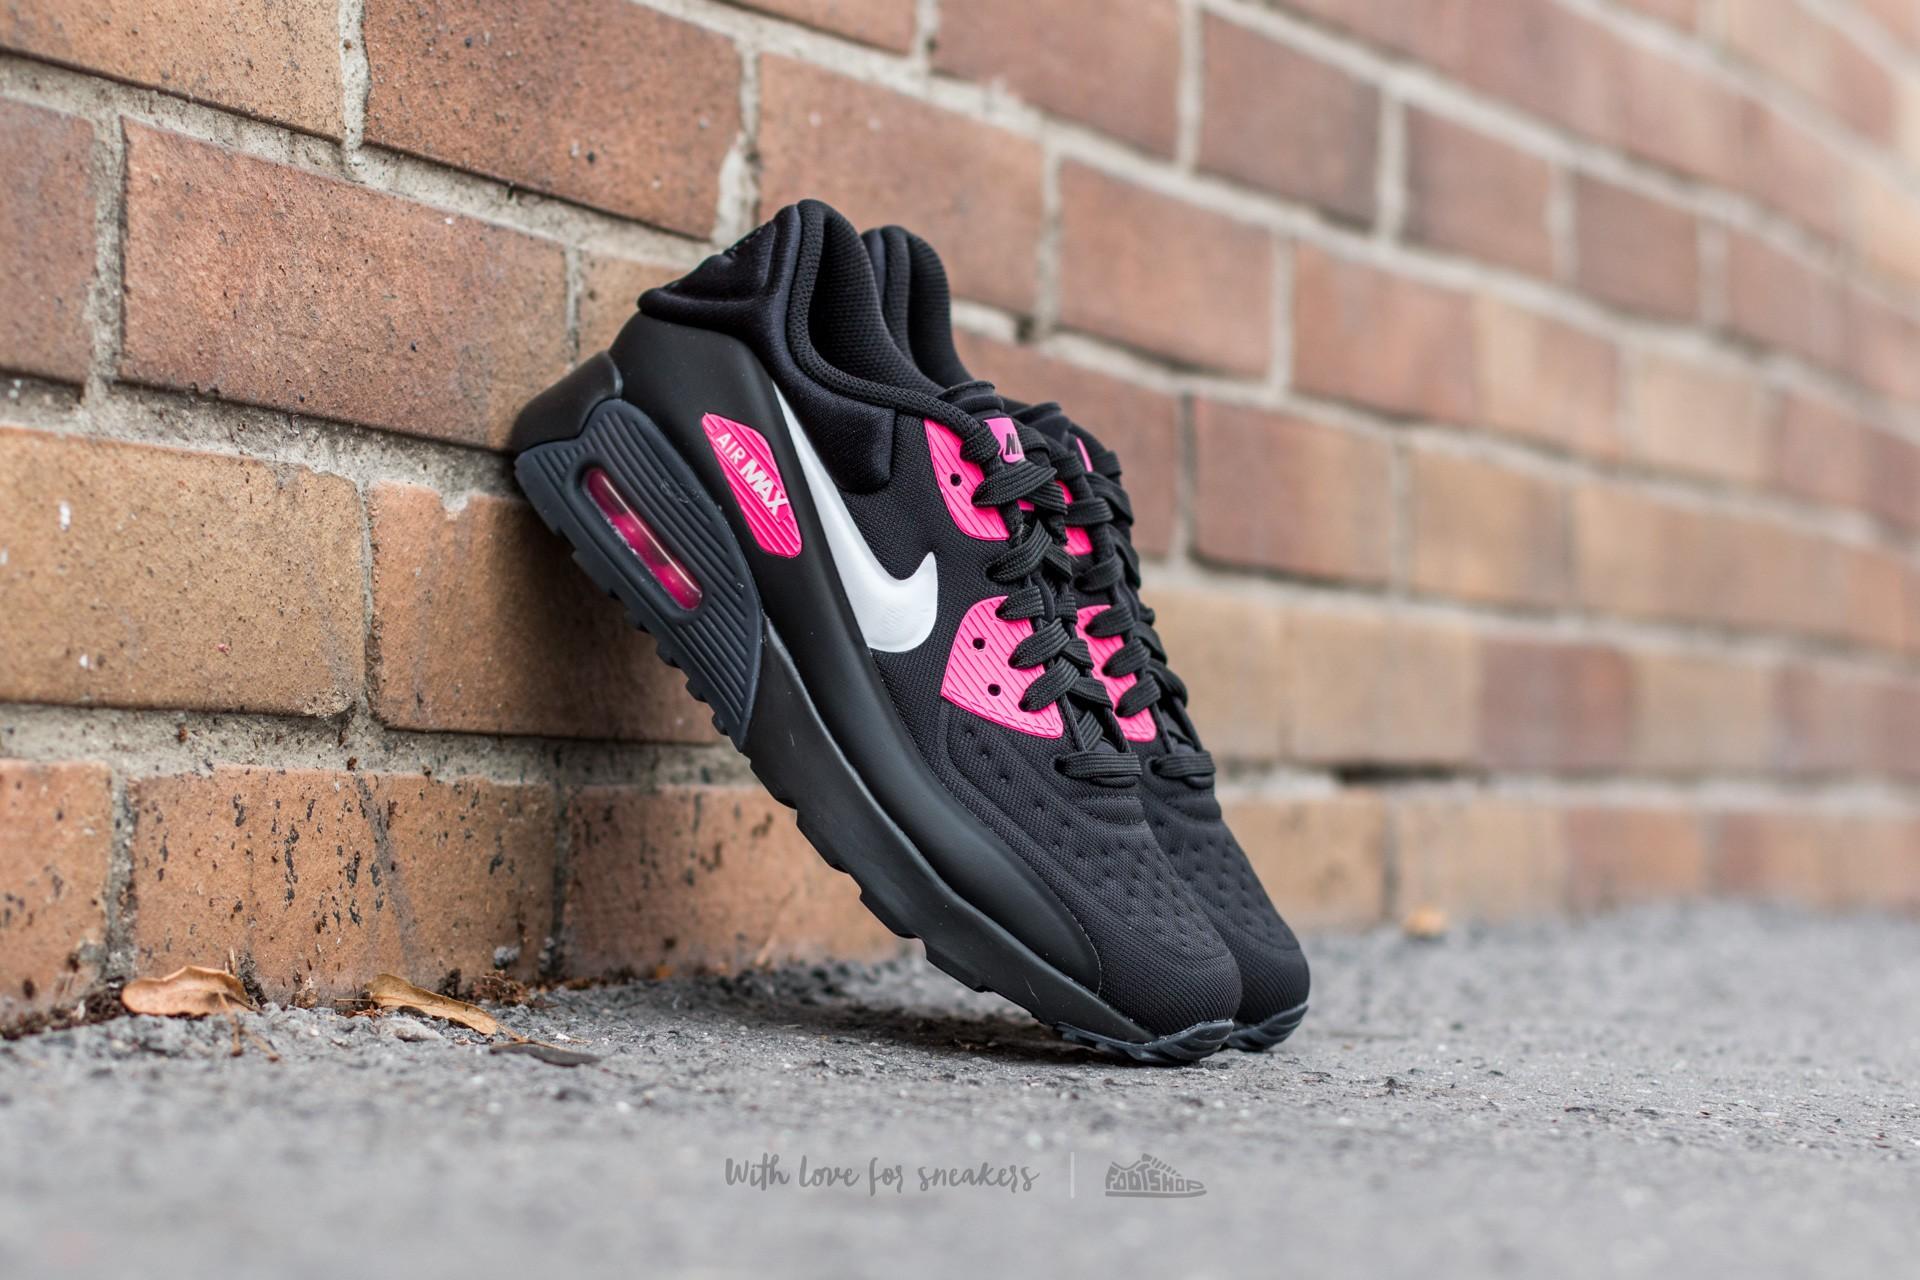 revelación engañar Aislar  Women's shoes Nike Air Max 90 Ultra SE (GS) Black/ White-Hyper Pink    Footshop